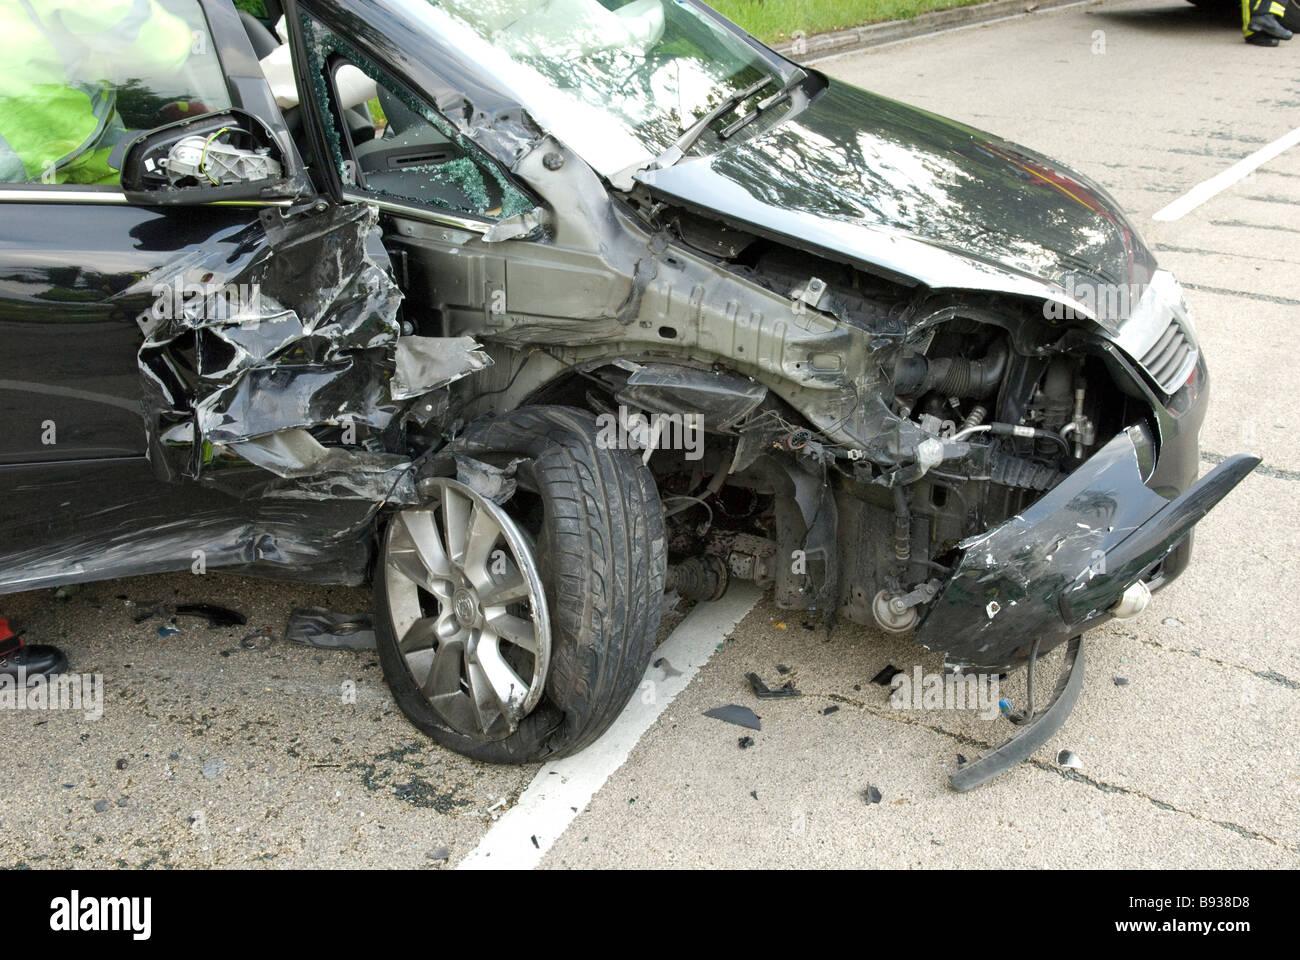 Crashed car with badly damaged wing RTC Stock Photo